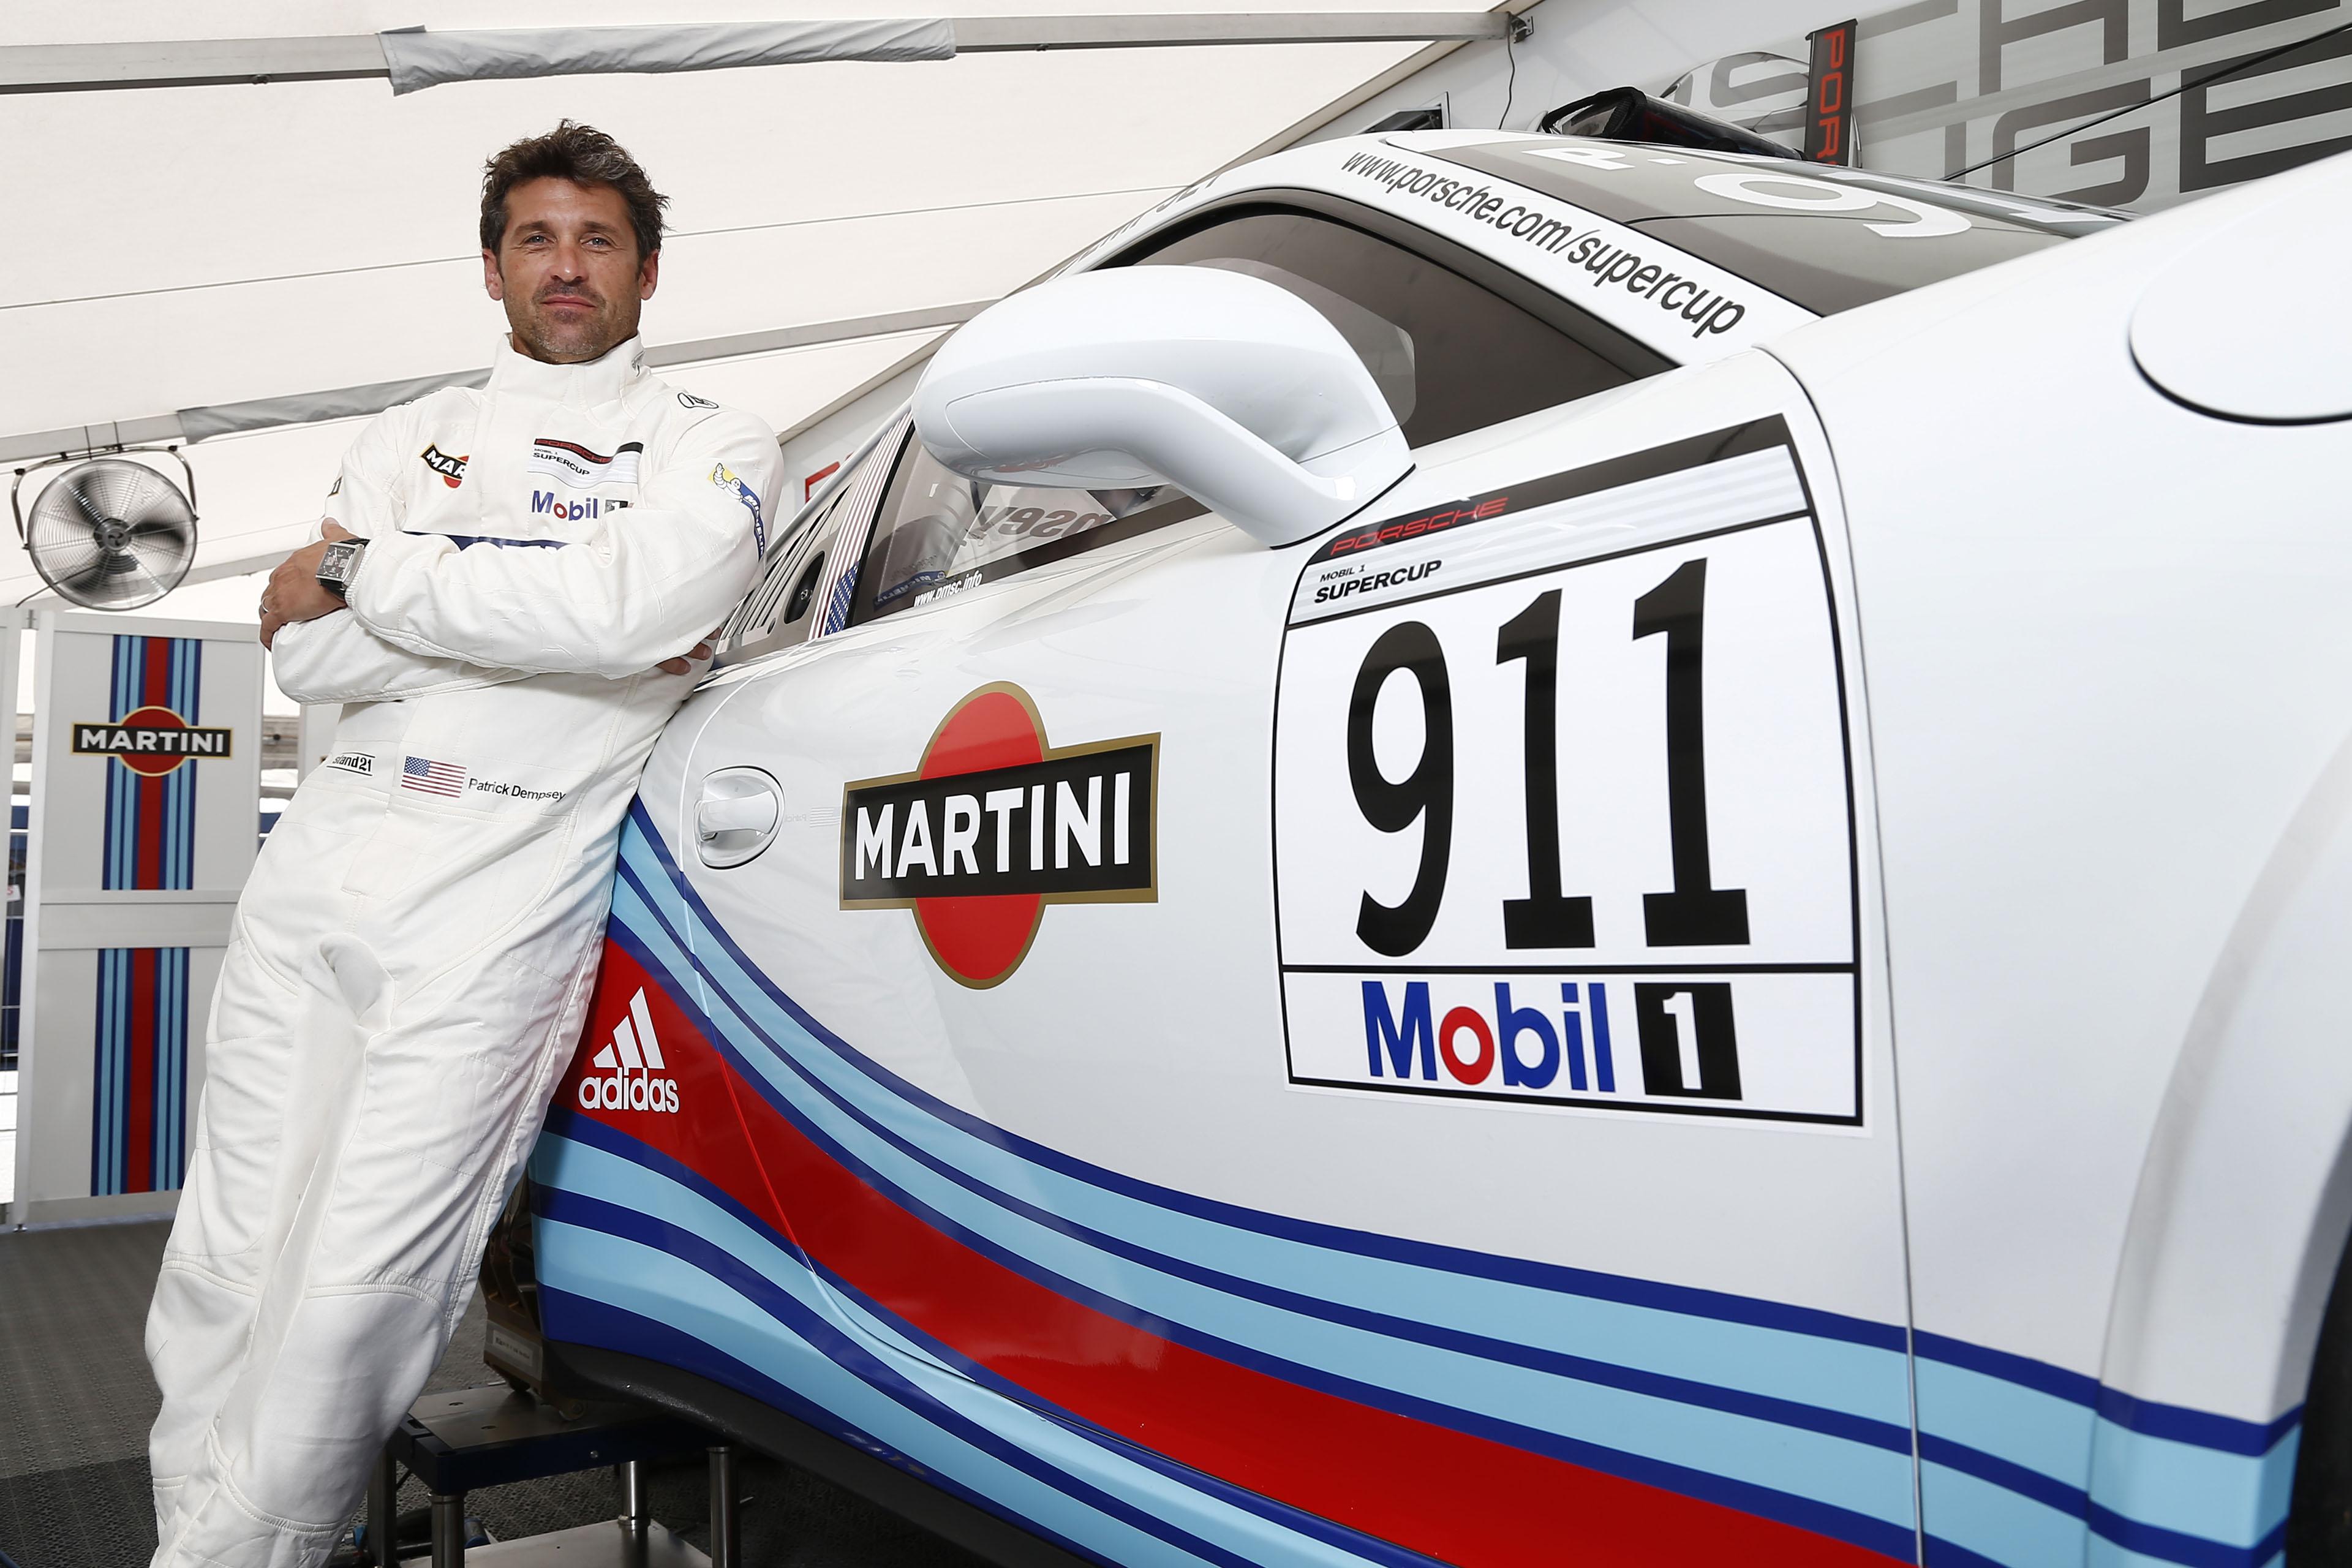 Patrick Dempsey Races For Martini In The Porsche Mobil 1